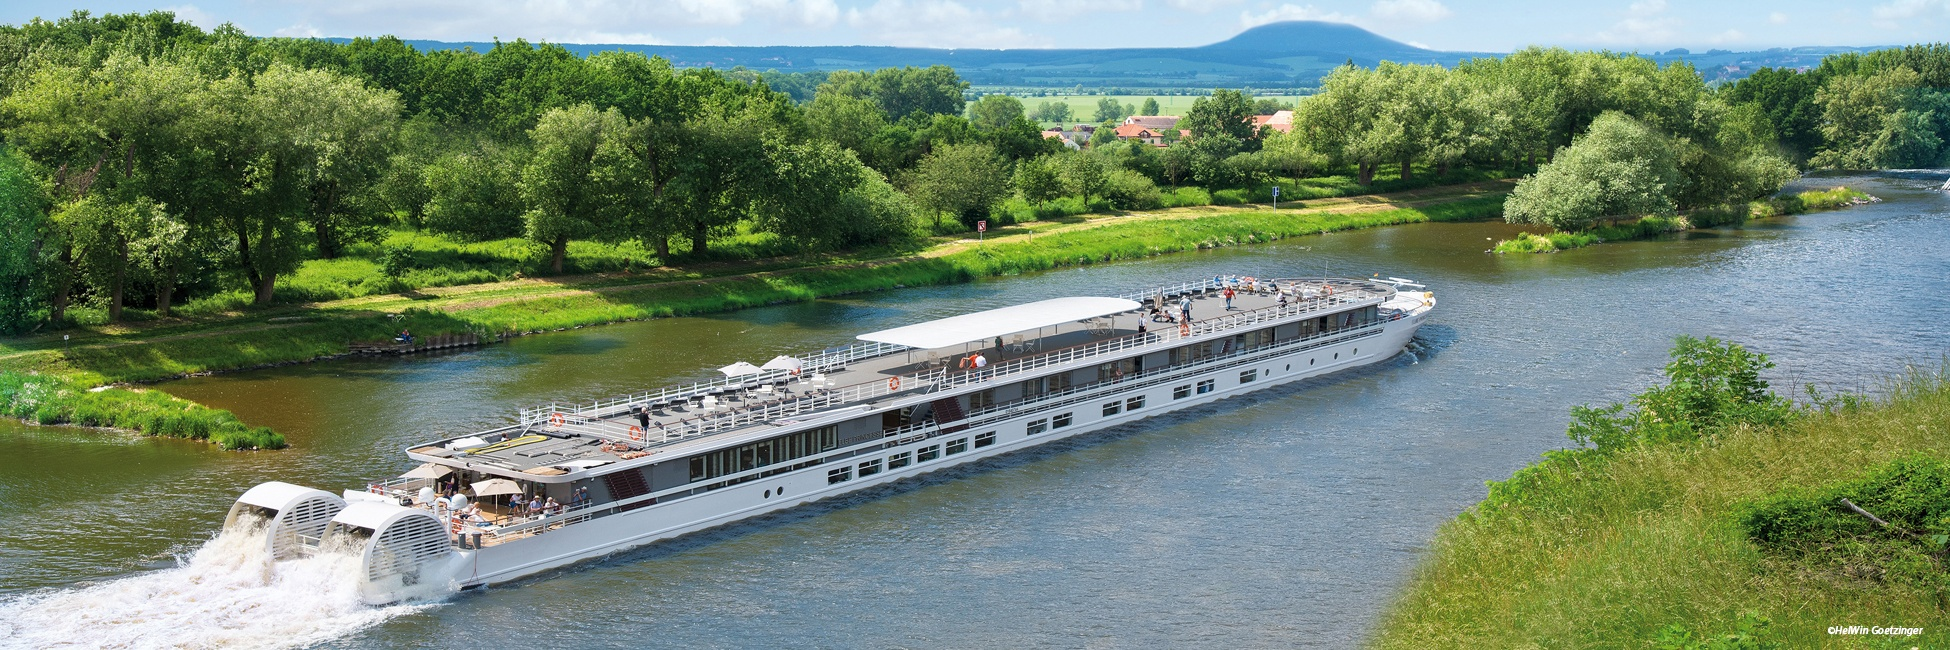 MS Elbe Princesse, navire 5 ancres